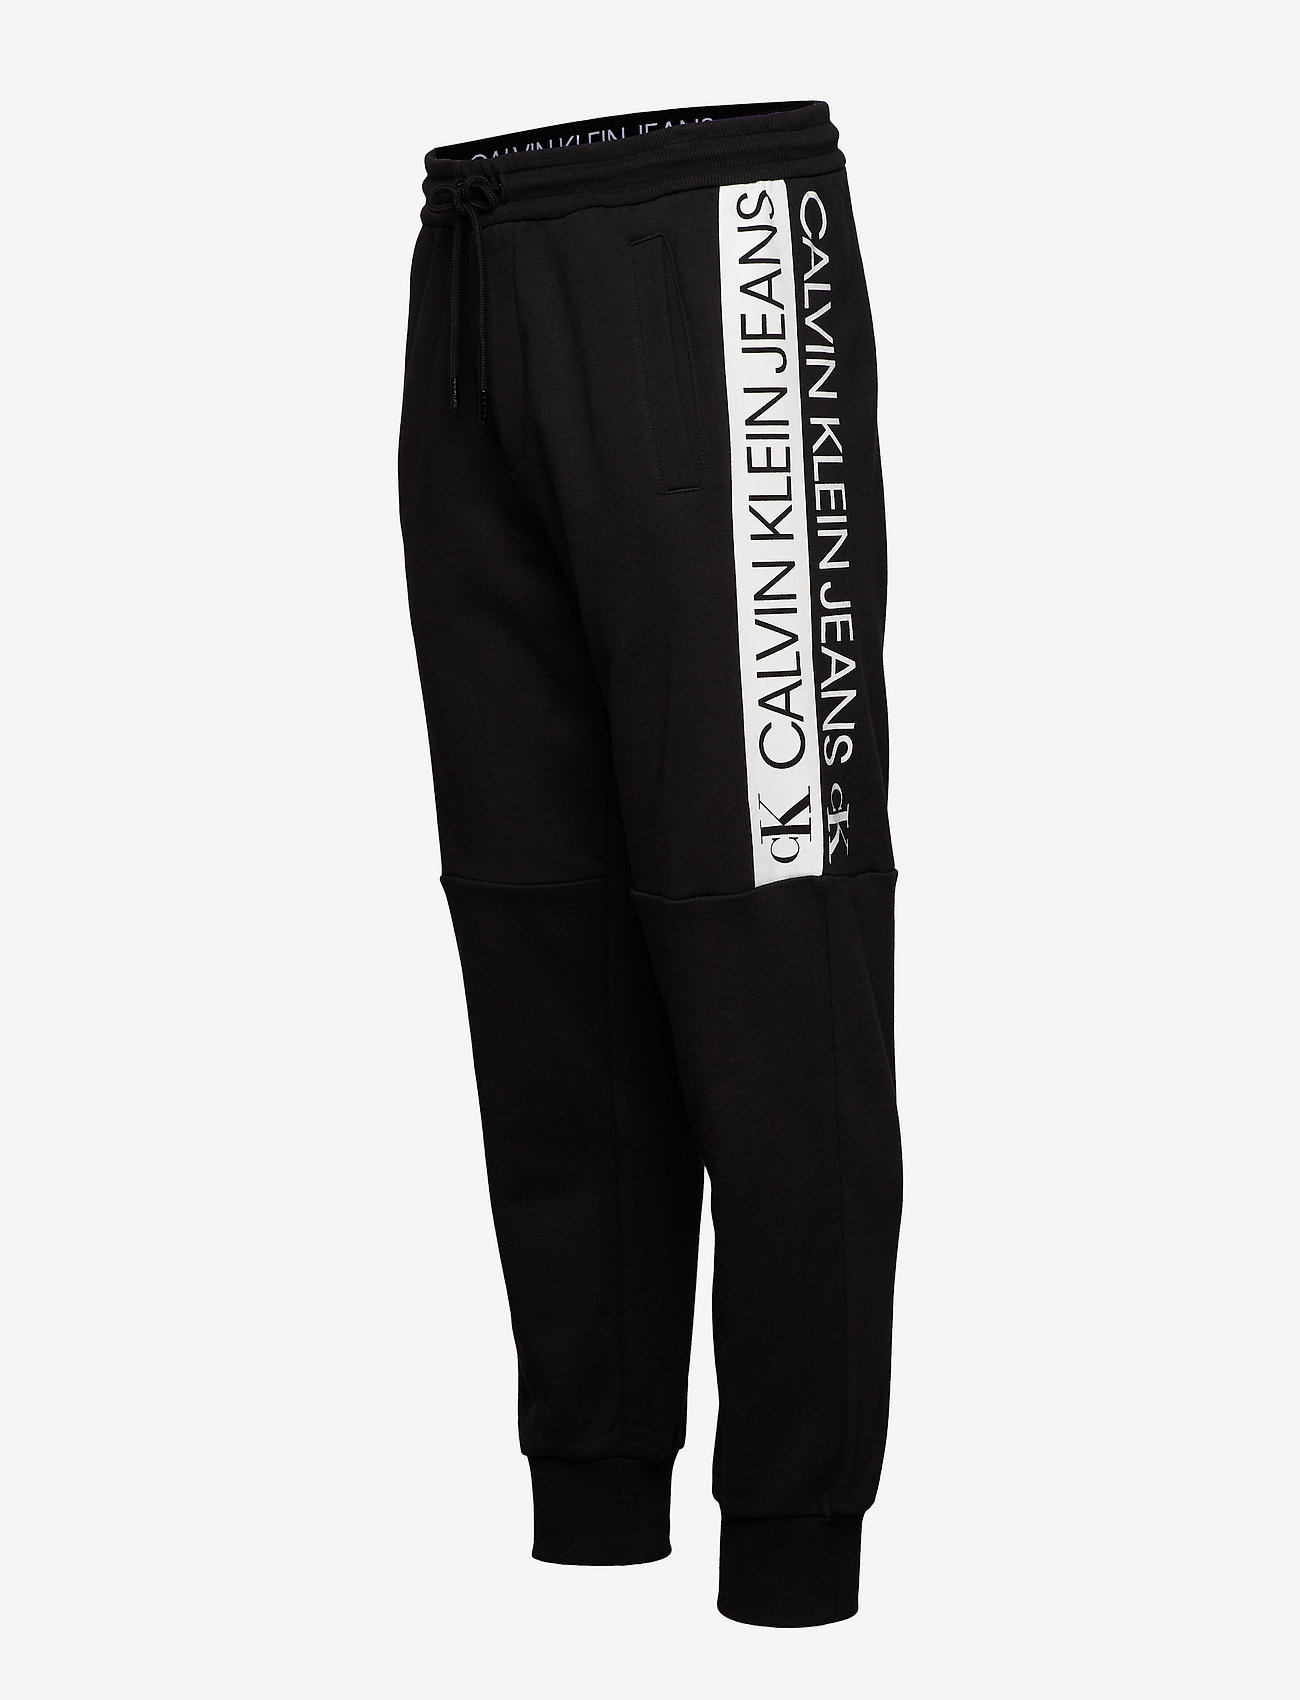 Calvin Klein Jeans - MIRROR LOGO HWK PANT - kleding - ck black - 2